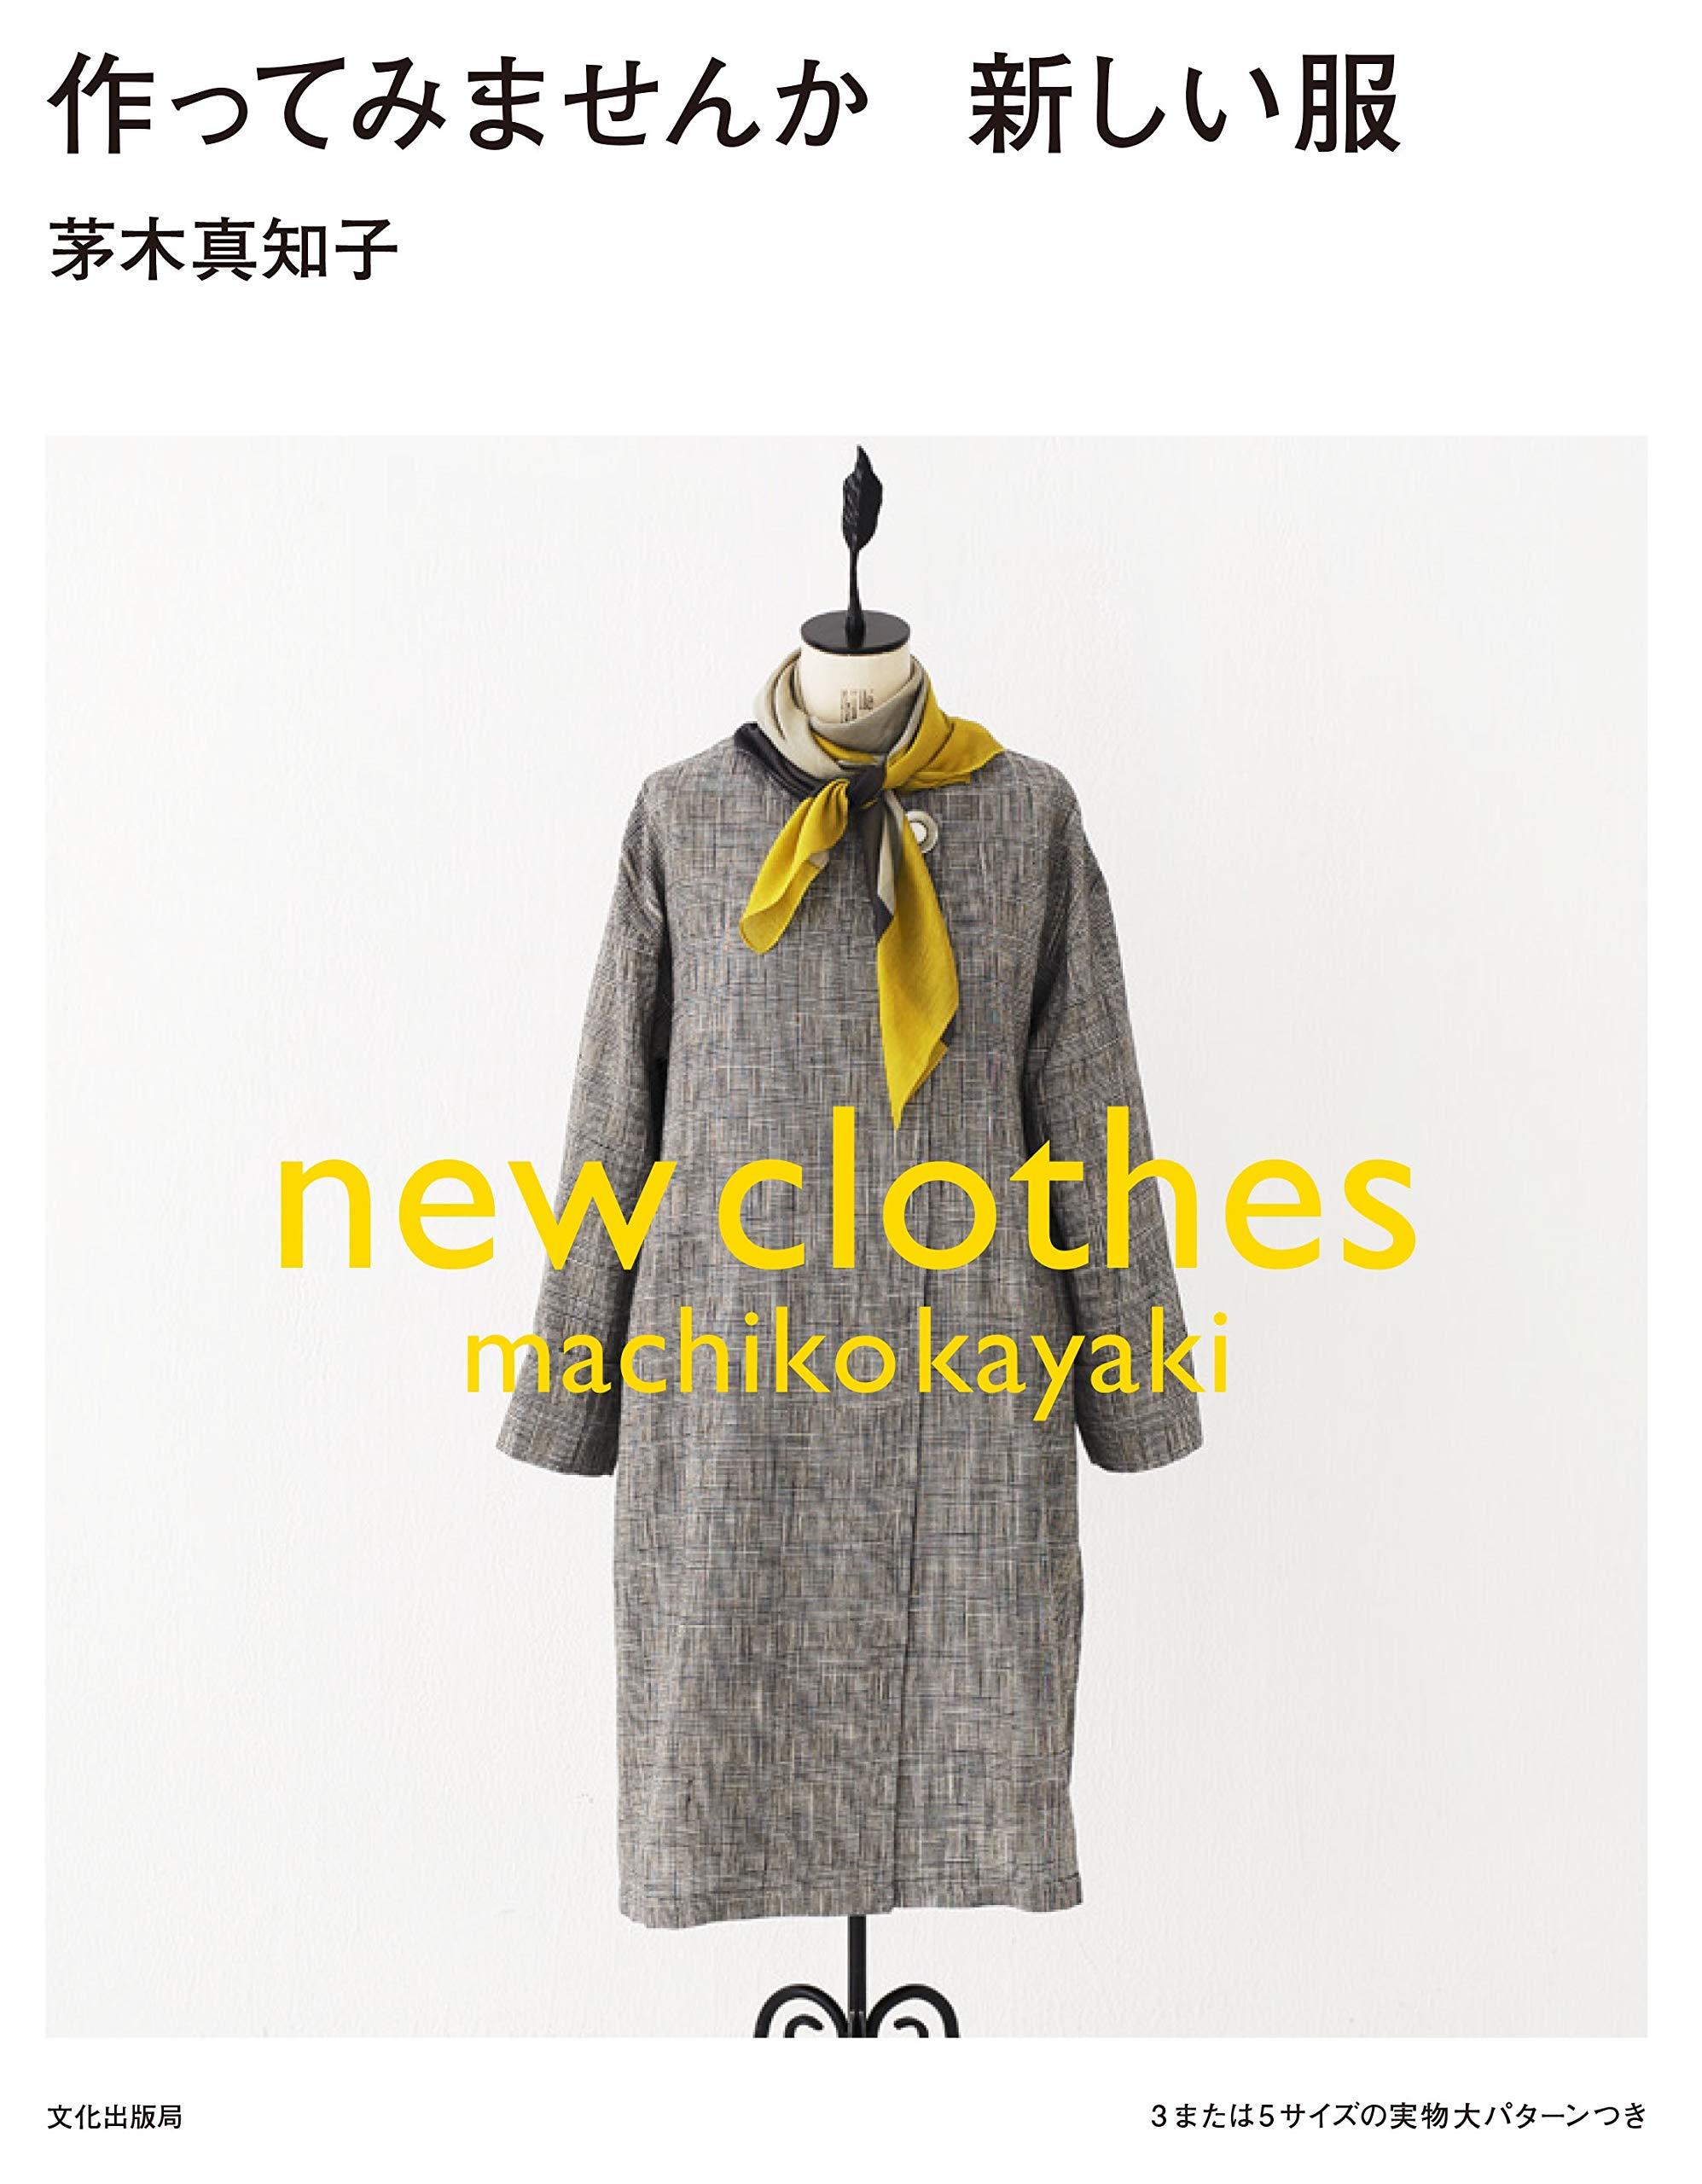 Want to Make New Clothes - Machiko Kayaki